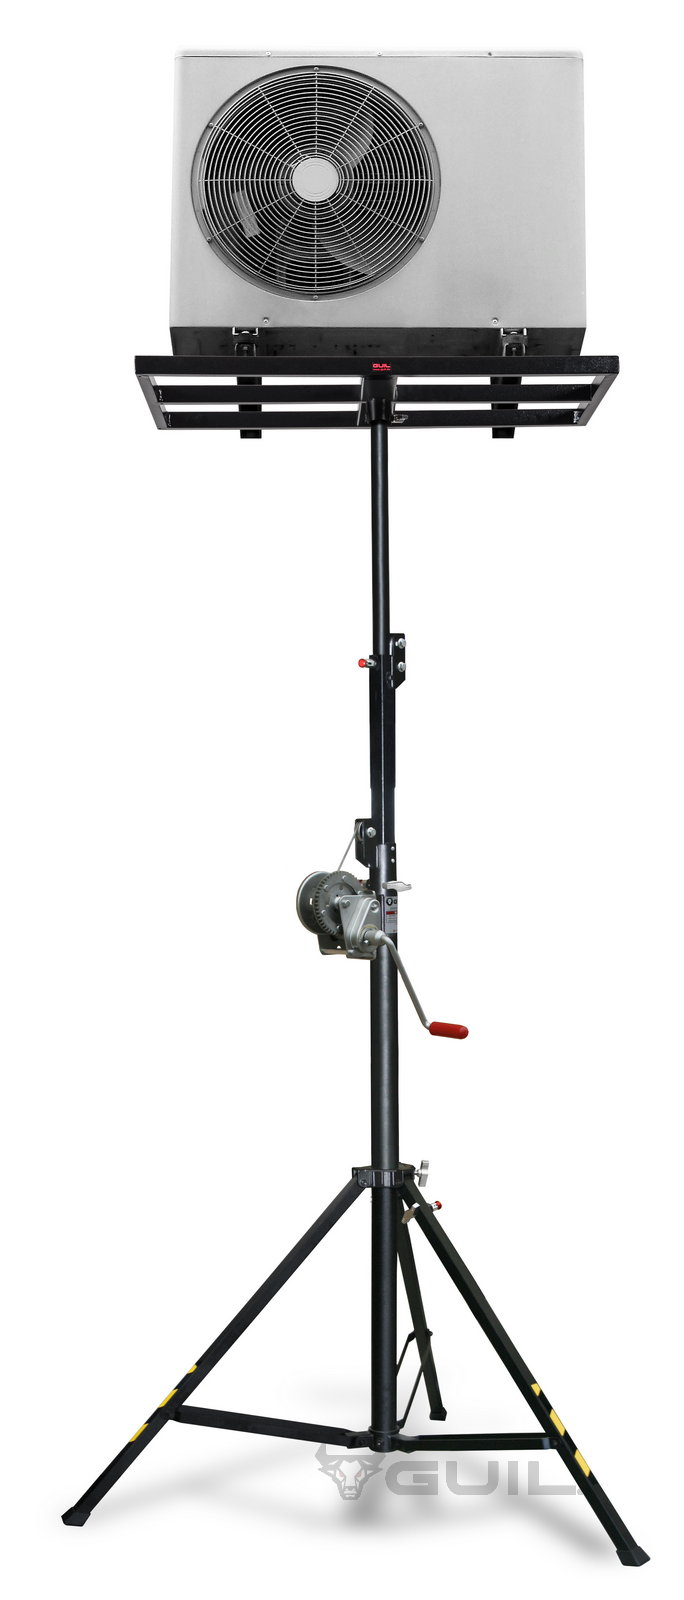 Materiaallift 1,7-4,0 m 100 kg (dutch) (7)